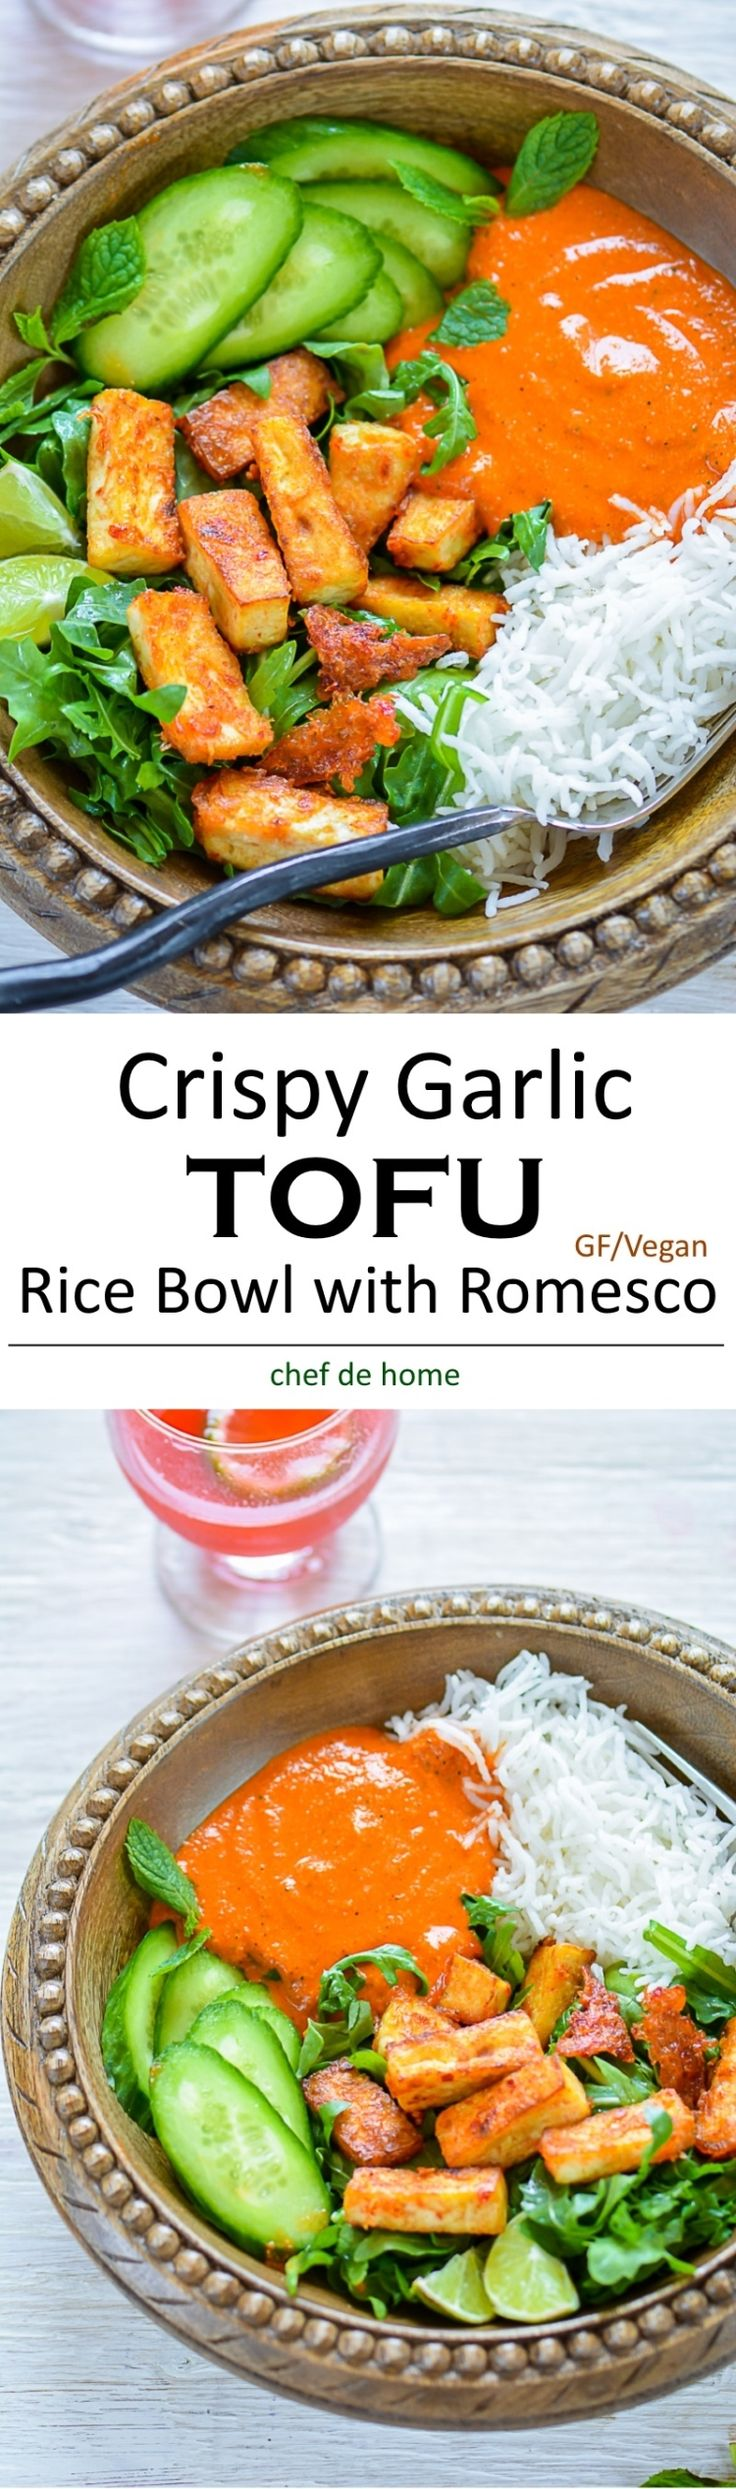 Crispy Garlic Fried Tofu with rice arugula and romesco sauce a gluten free and vegan summer dinner | chefdehome.com